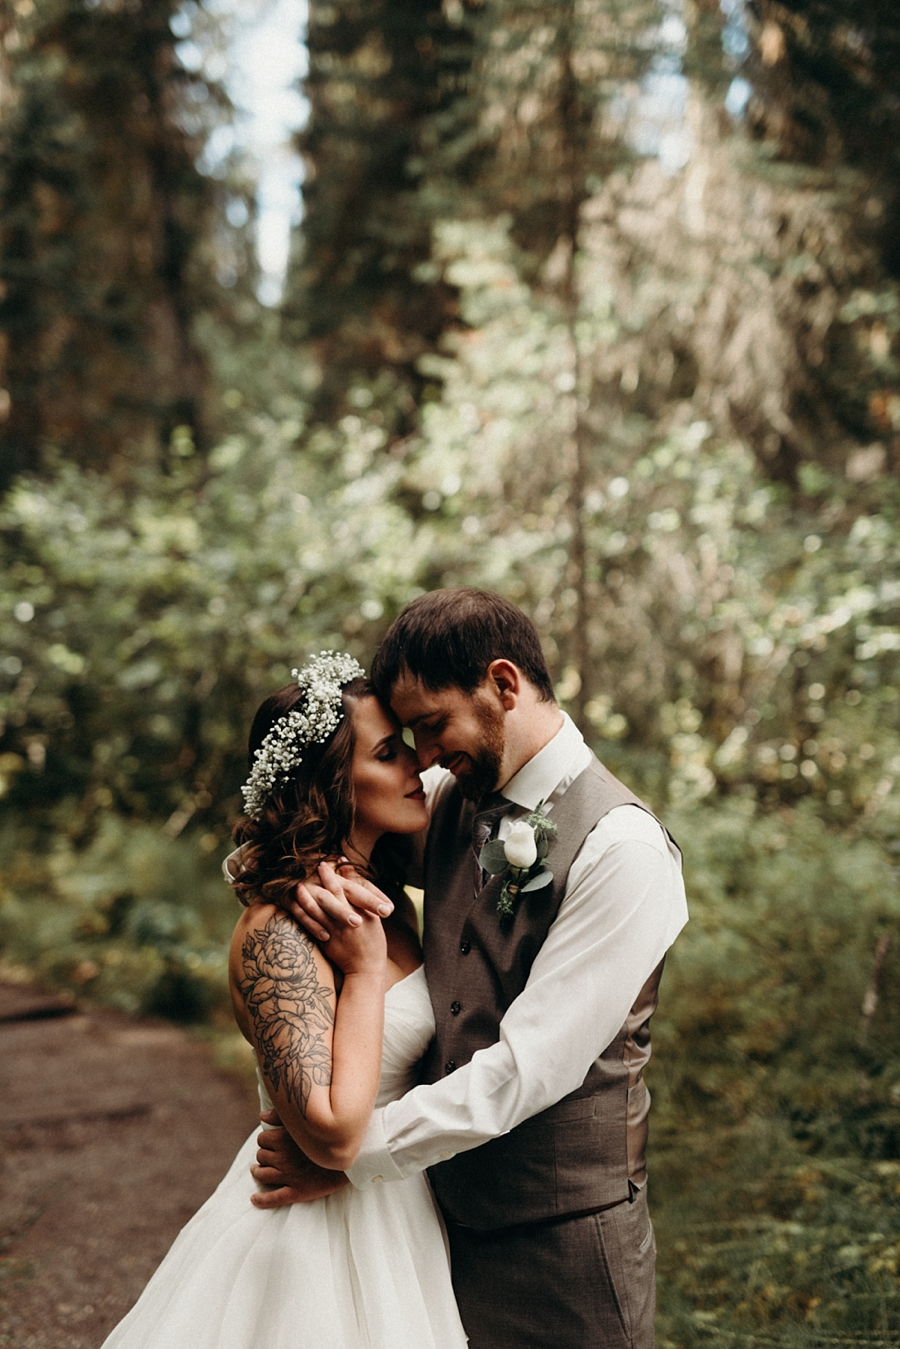 kaihla_tonai_intimate_wedding_elopement_photographer_7301.jpg